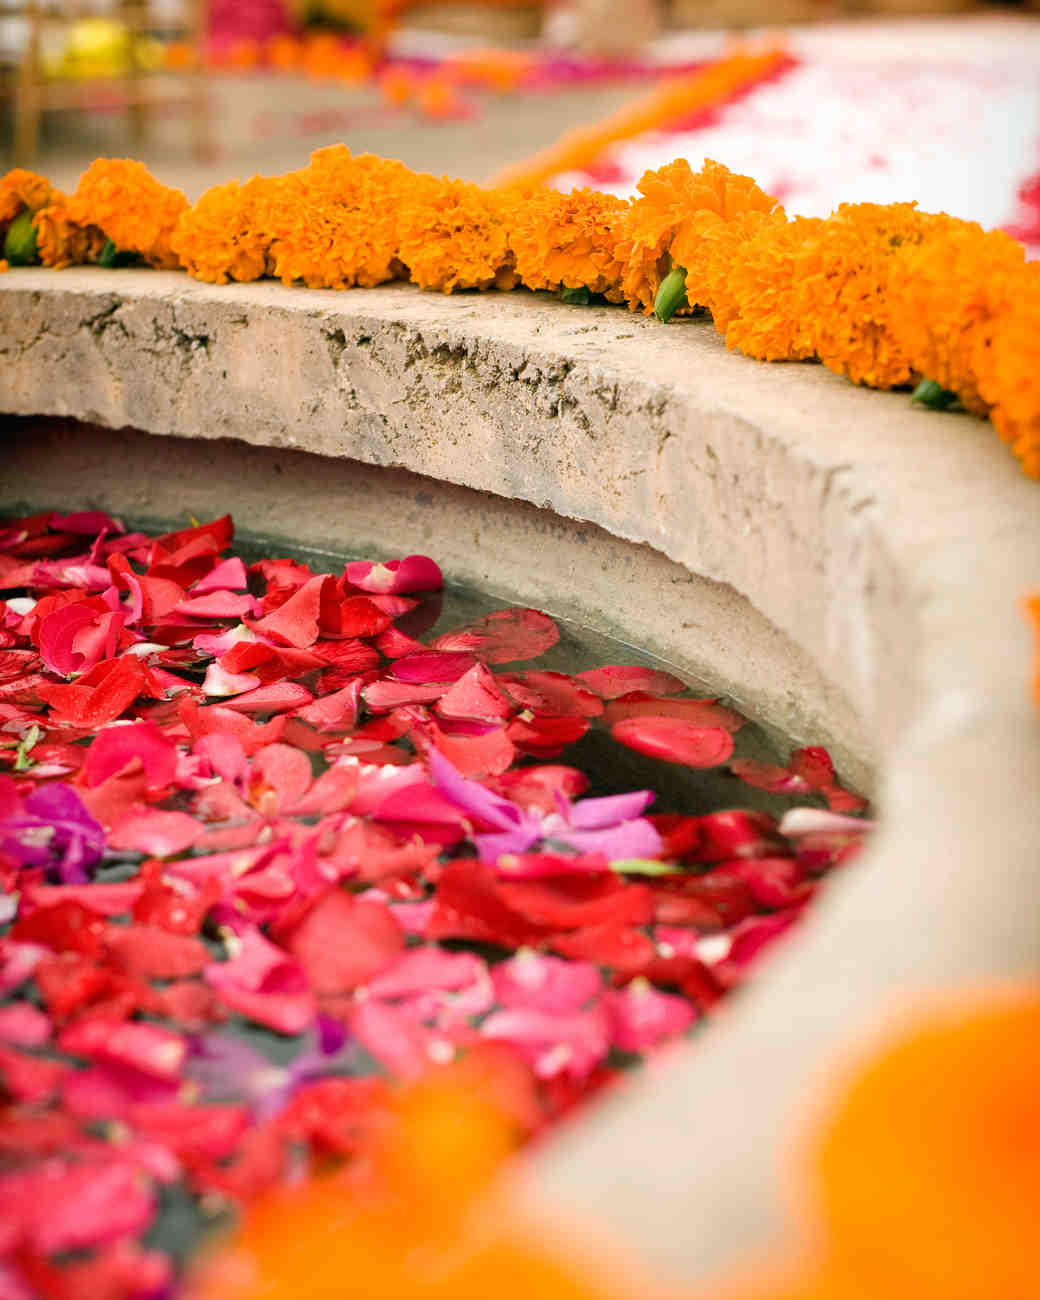 real-weddings-gairu-daniel-0611ph074.jpg